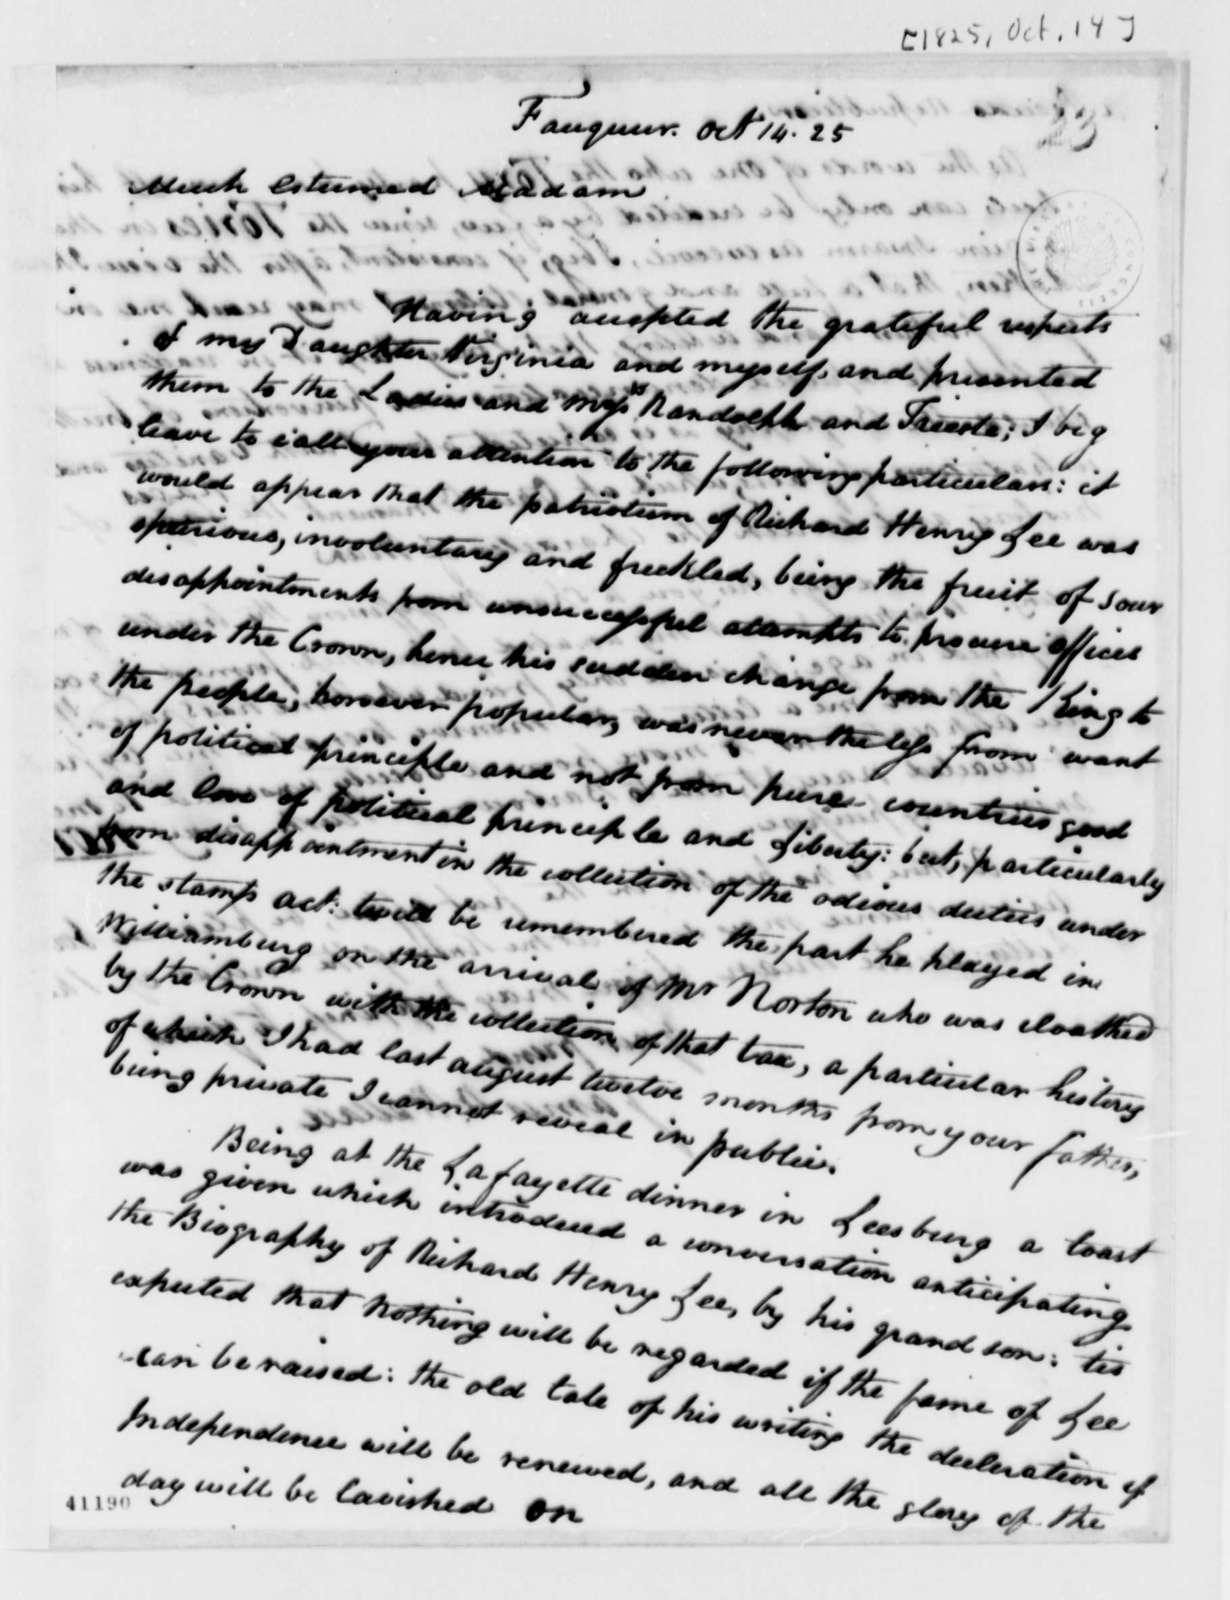 James W. Wallace to Martha Jefferson Randolph, October 14, 1825